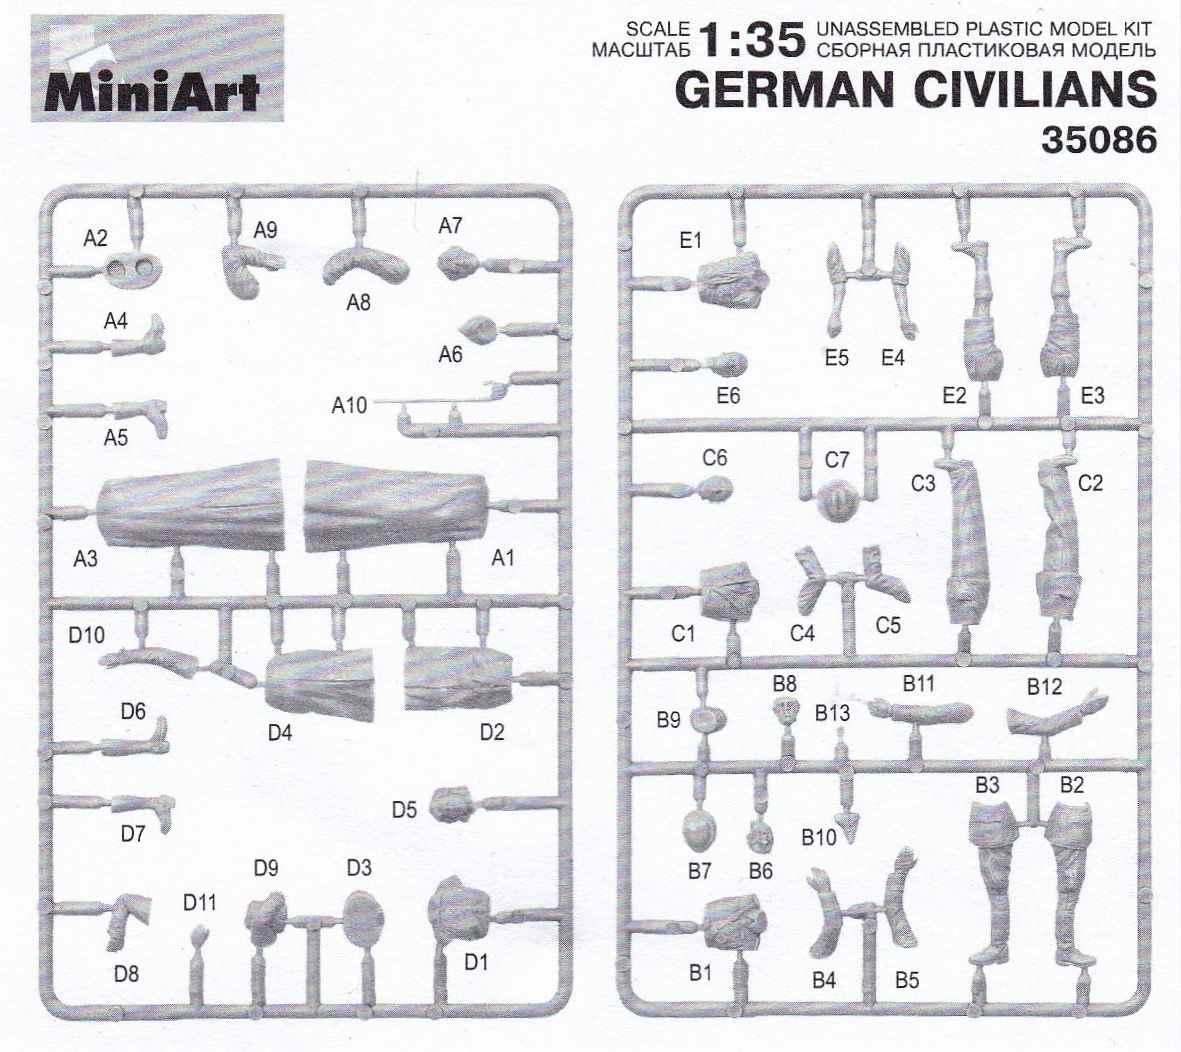 MiniArt-35086-German-Civilians-17 Figurenset German Civilians von MiniArt # 35086